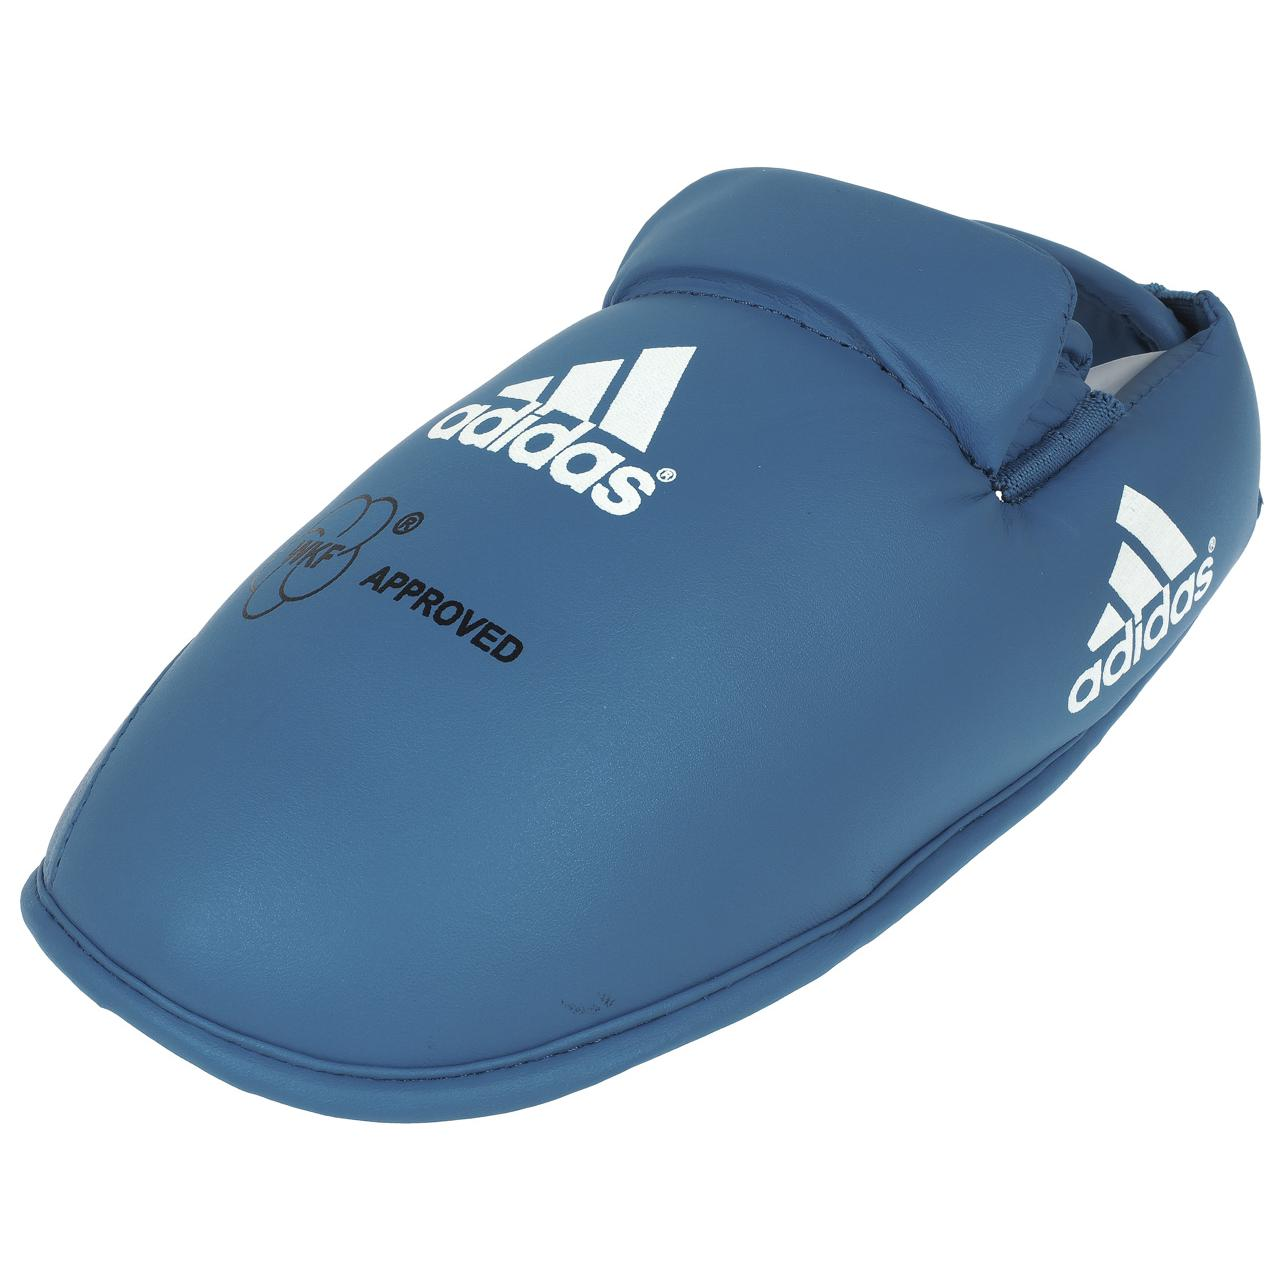 Protects-Feet-Karate-Adidas-Protege-Feet-Blue-Karate-Blue-58599-New